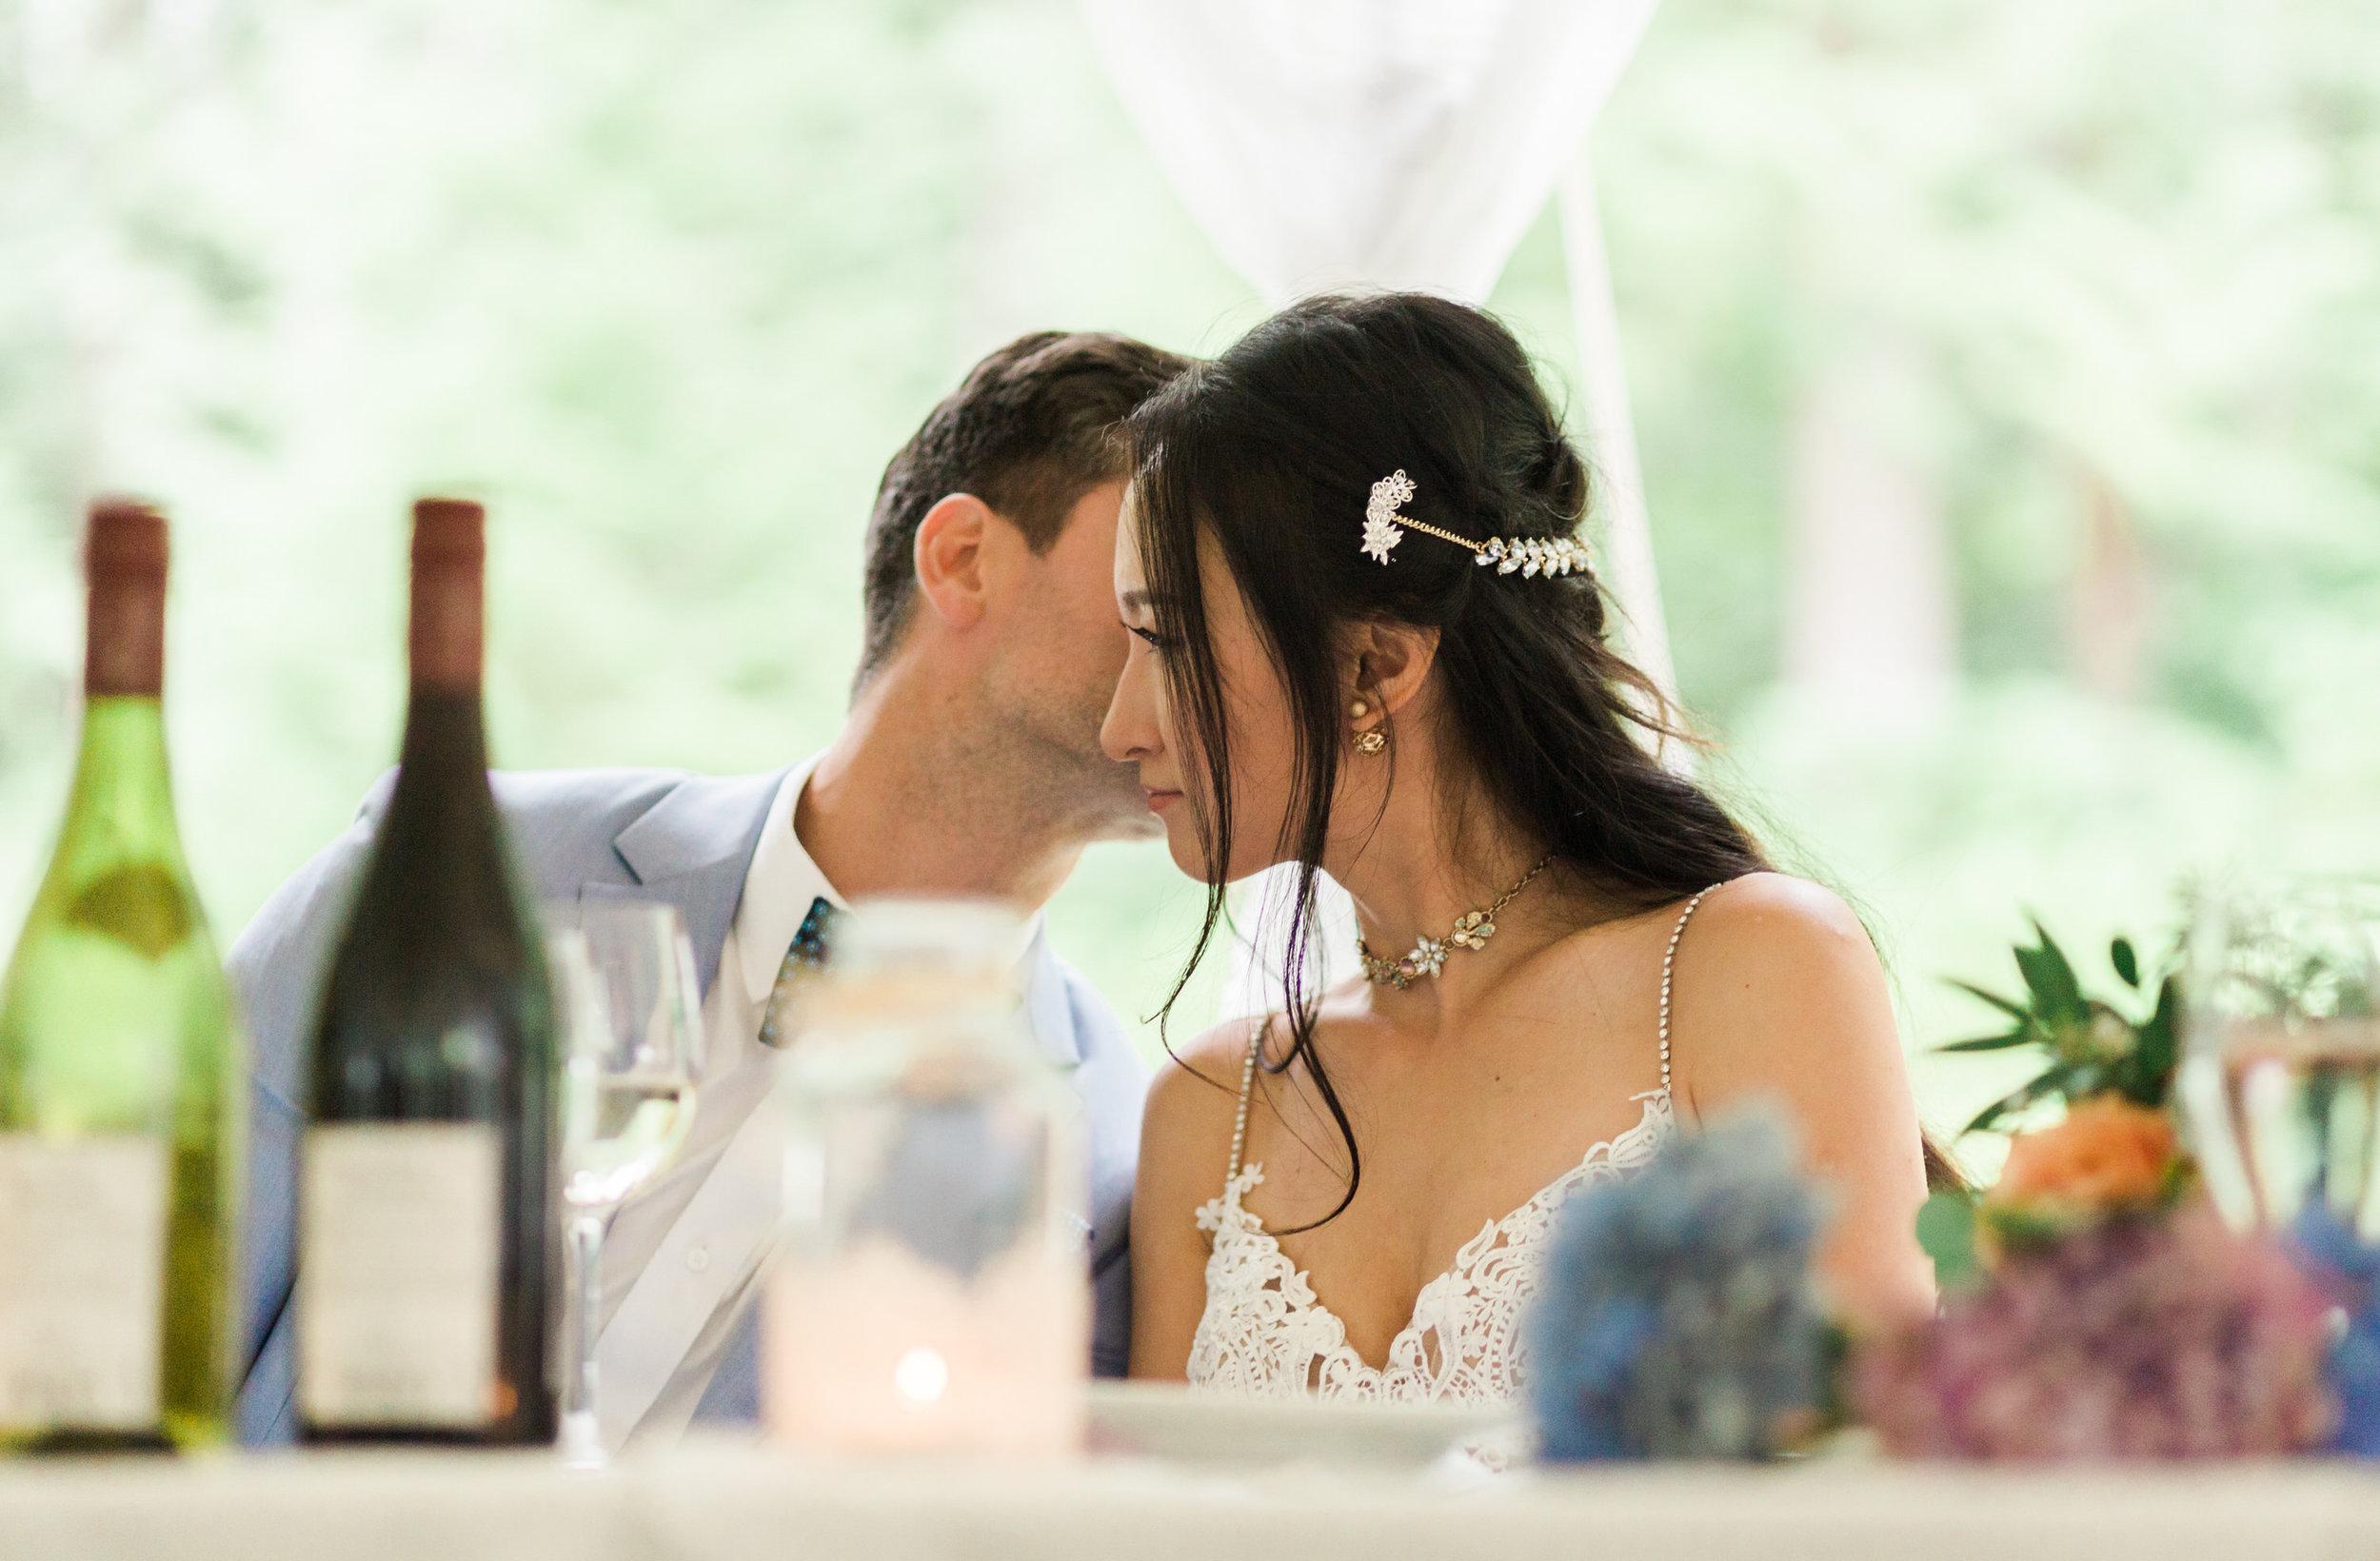 Linwood House Wedding Photos - Roberts Creek Wedding Photos - Vancouver Wedding Photographer & Videographer - Sunshine Coast Wedding Photos - Sunshine Coast Wedding Photographer - Jennifer Picard Photography - IMG_1136.jpg